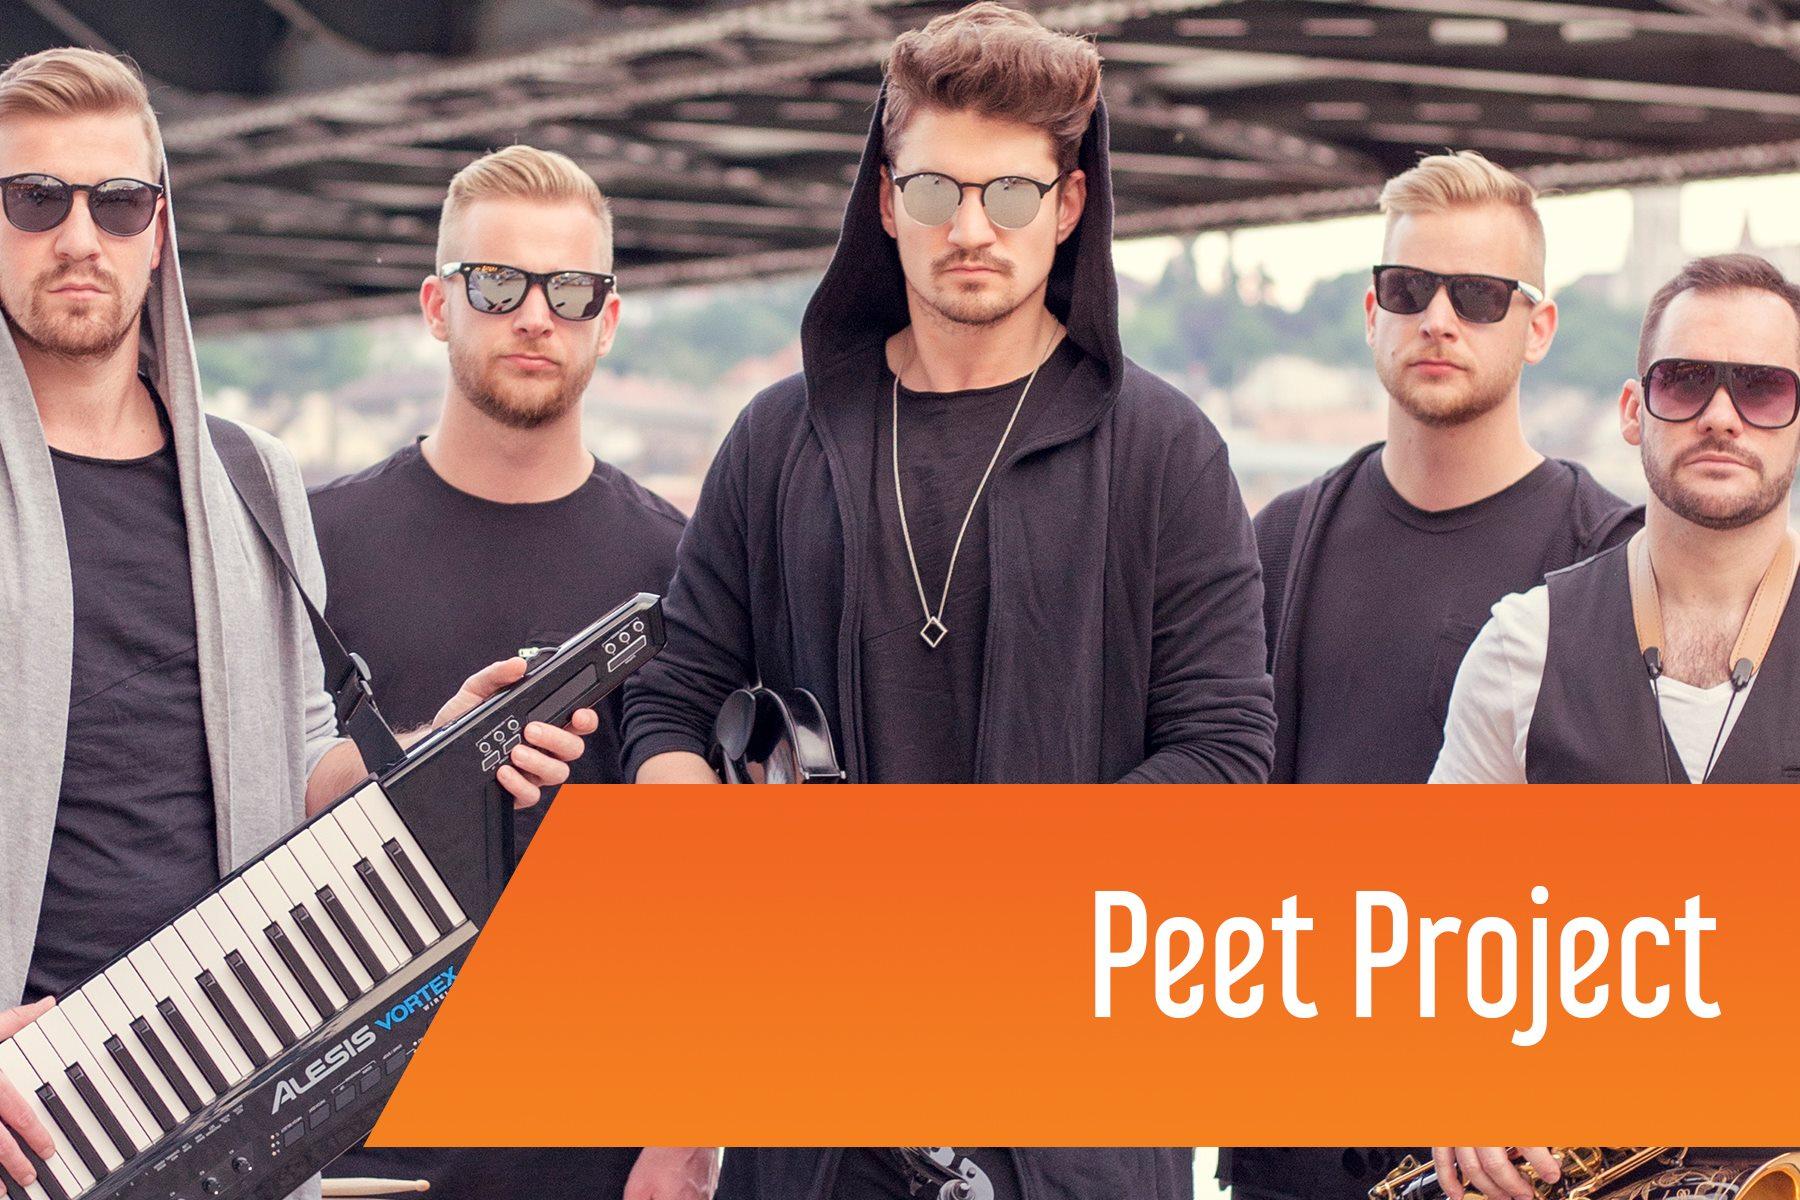 Peet Project